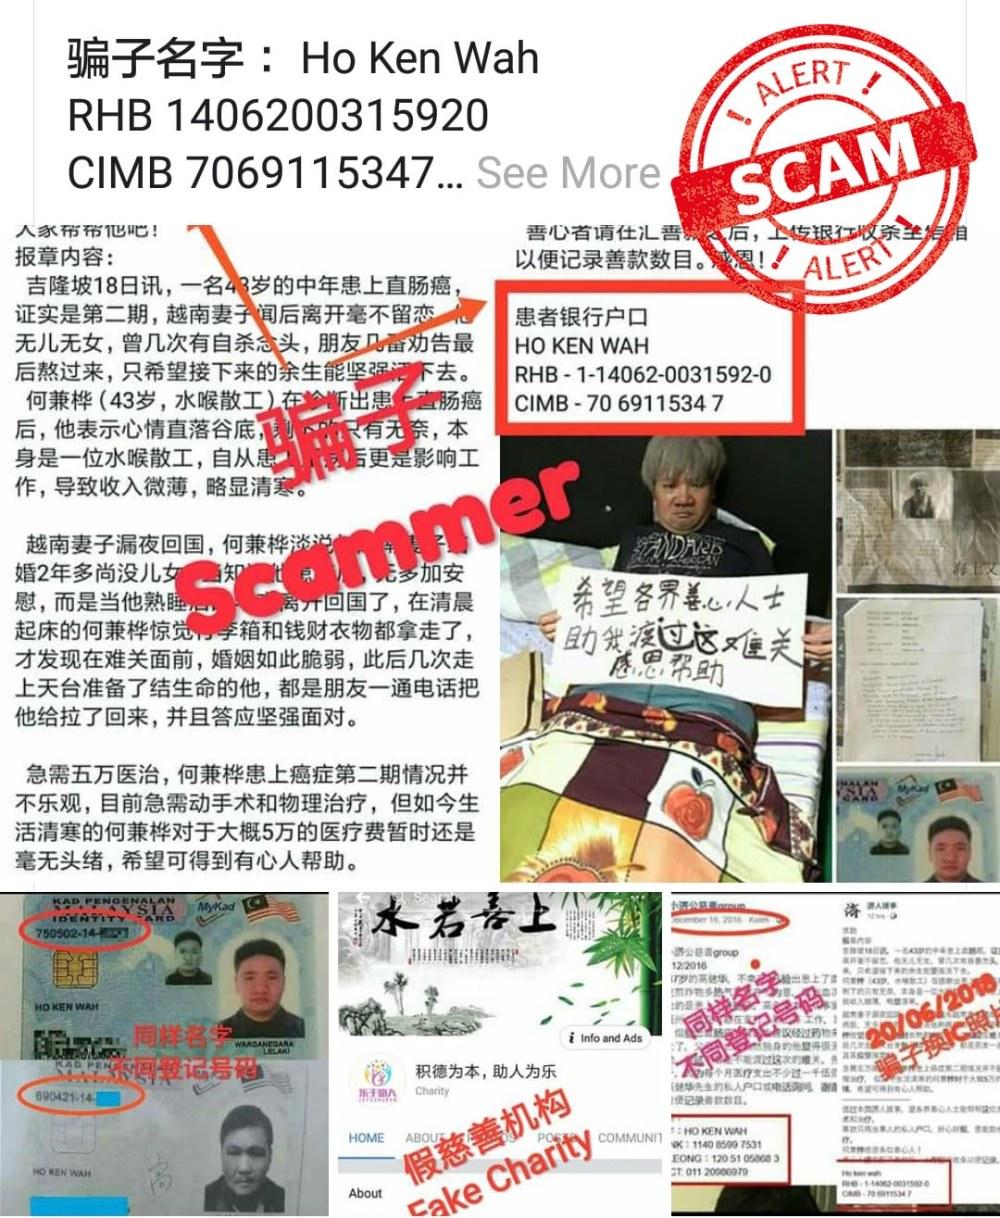 Charity Scam Ho Ken Wah 01